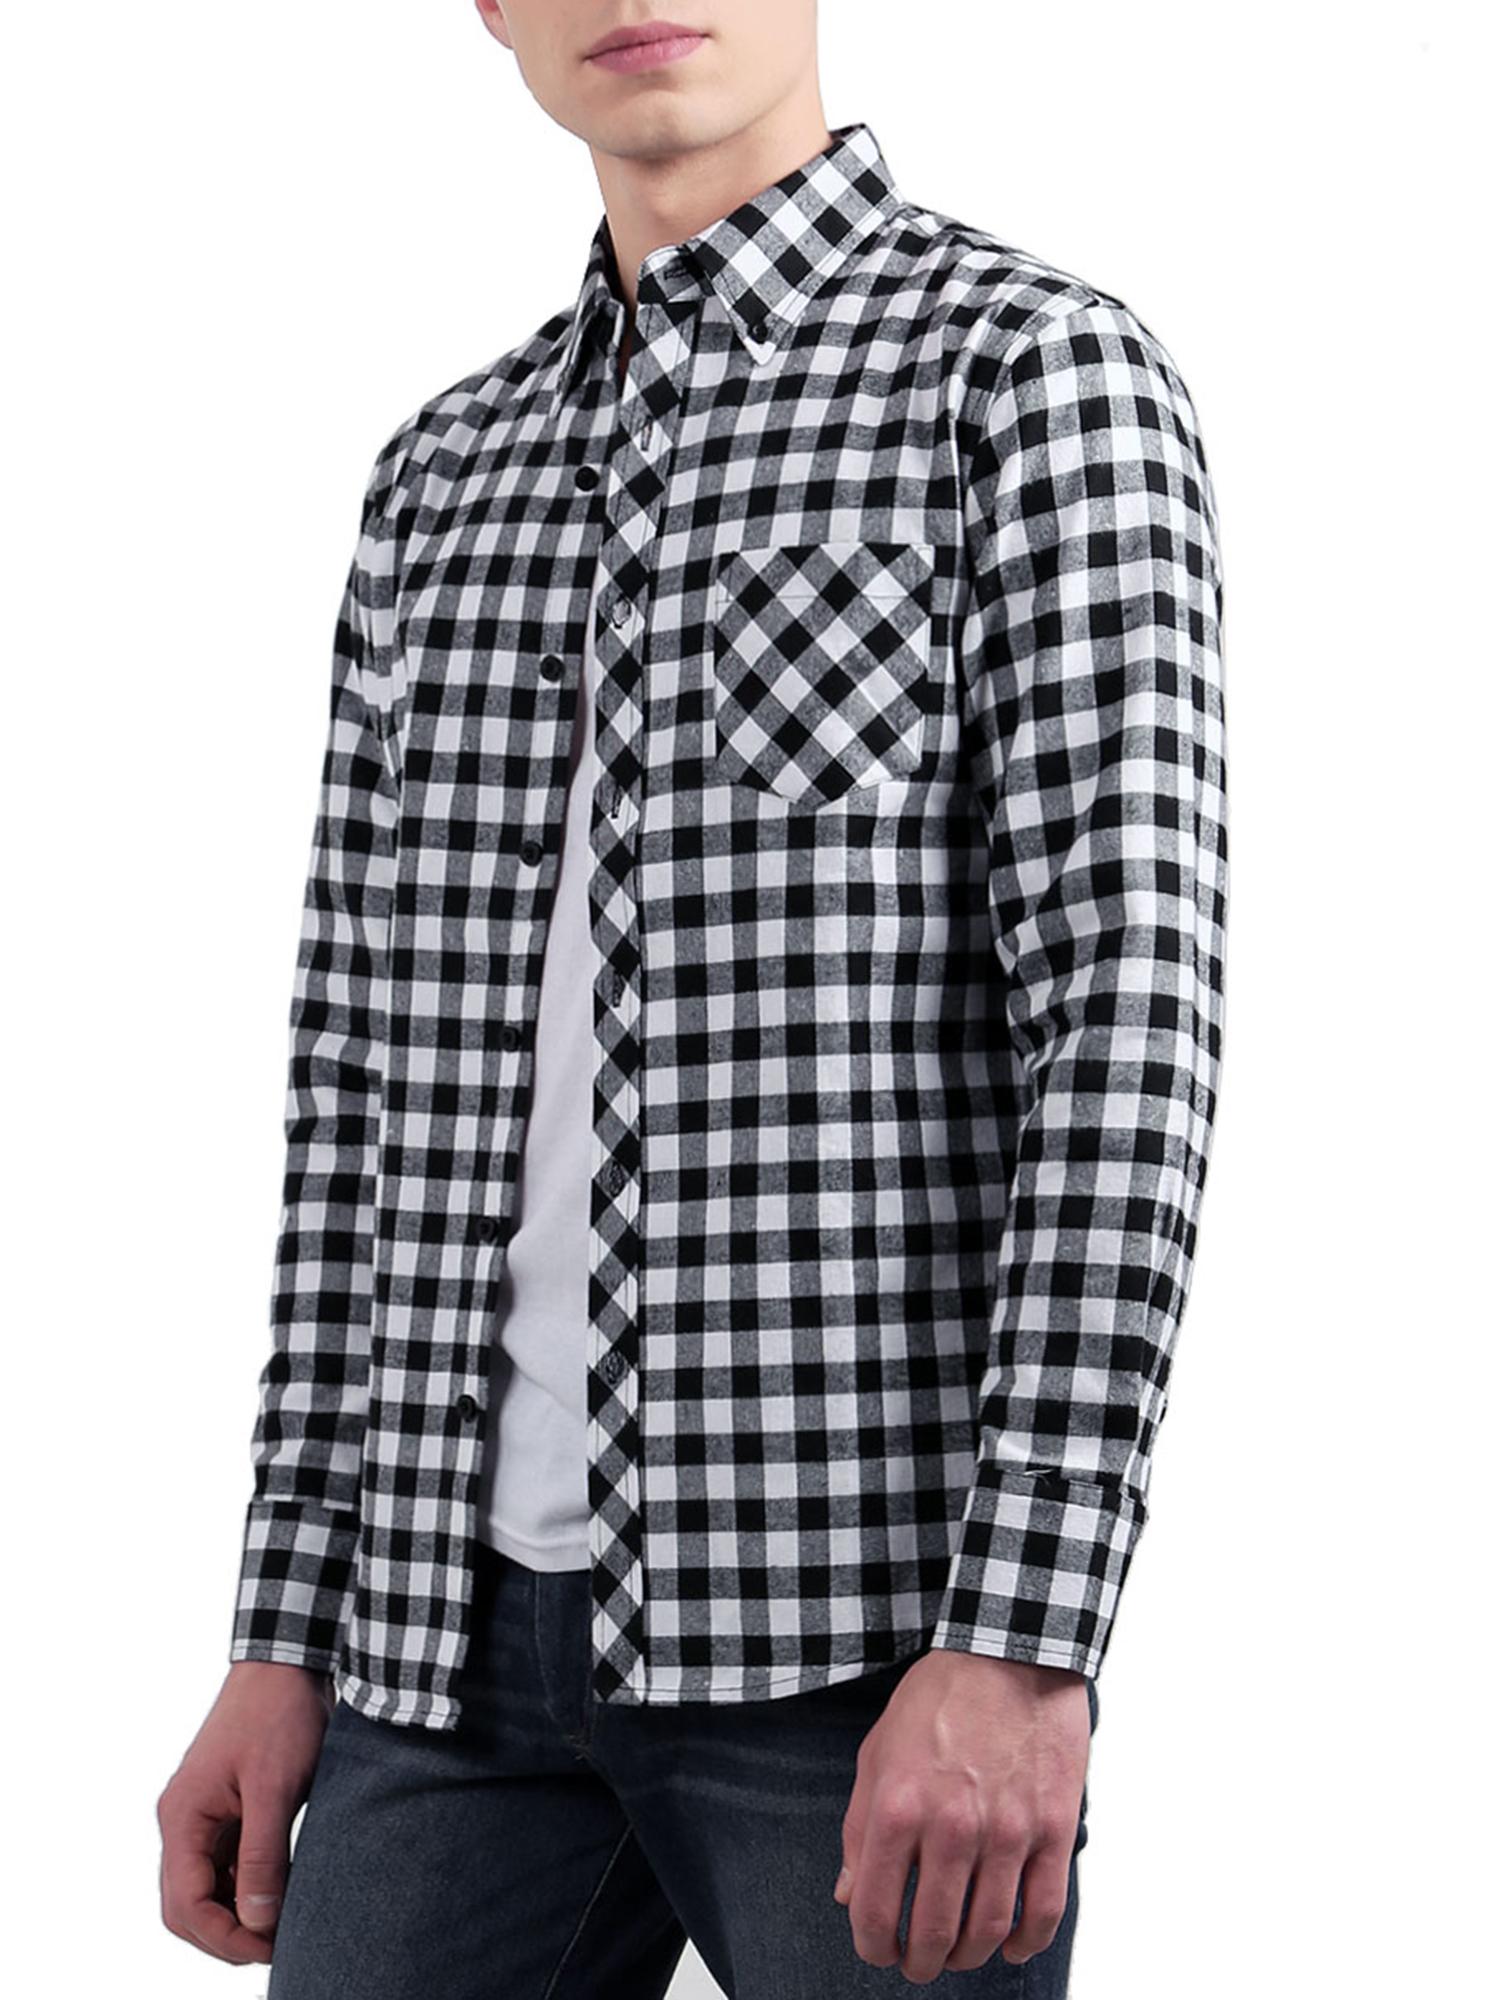 Men Pocket Point Collar Plaids Long Sleeves Button Down Shirt Black White M